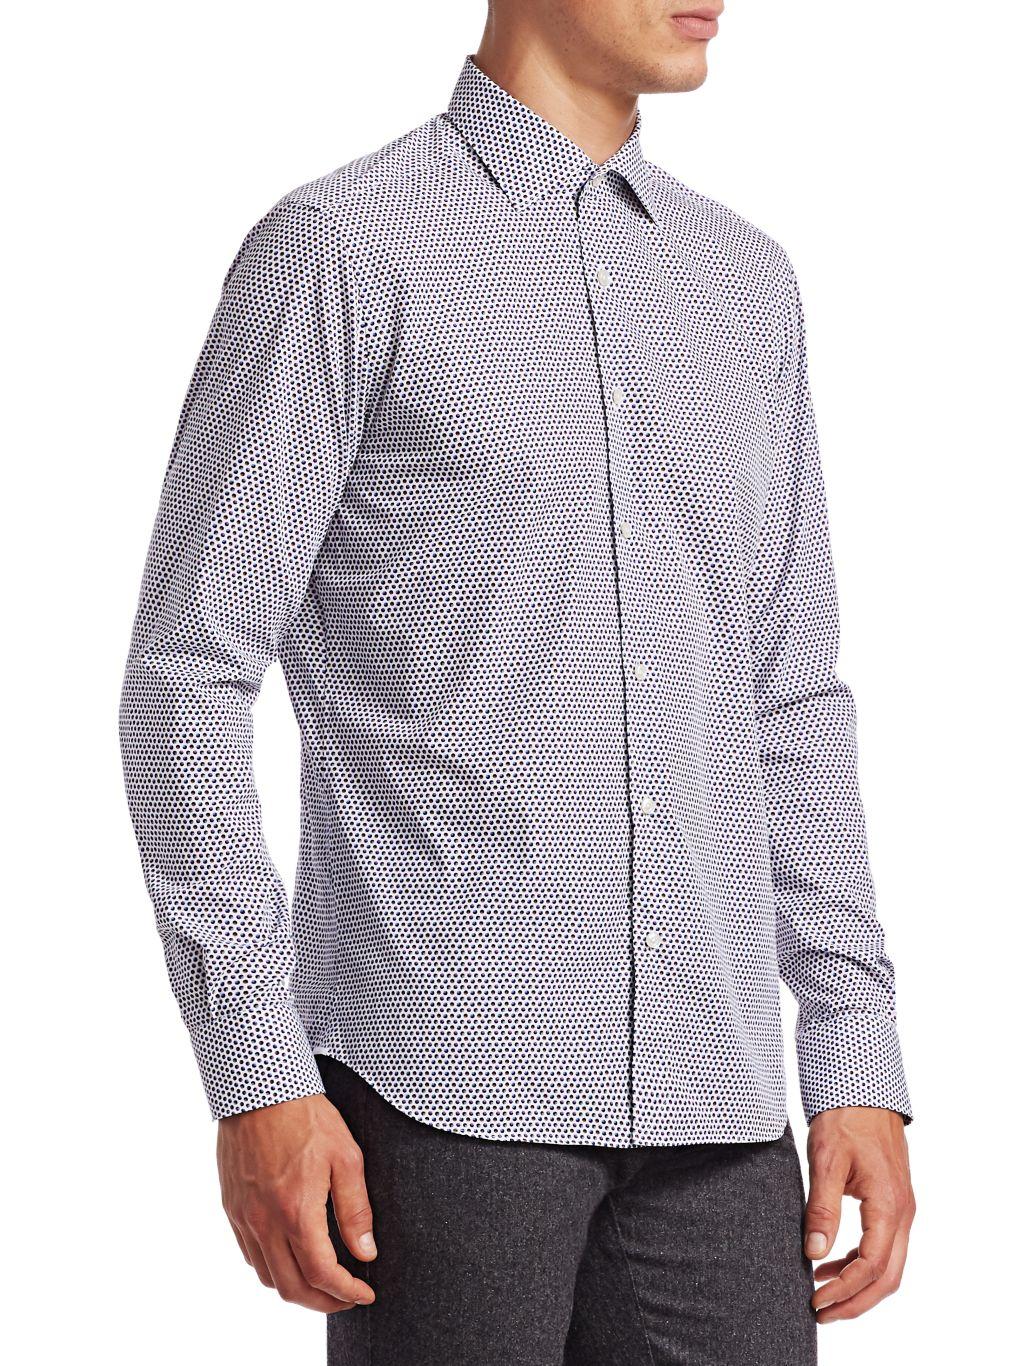 Saks Fifth Avenue Circle-Print Cotton Shirt